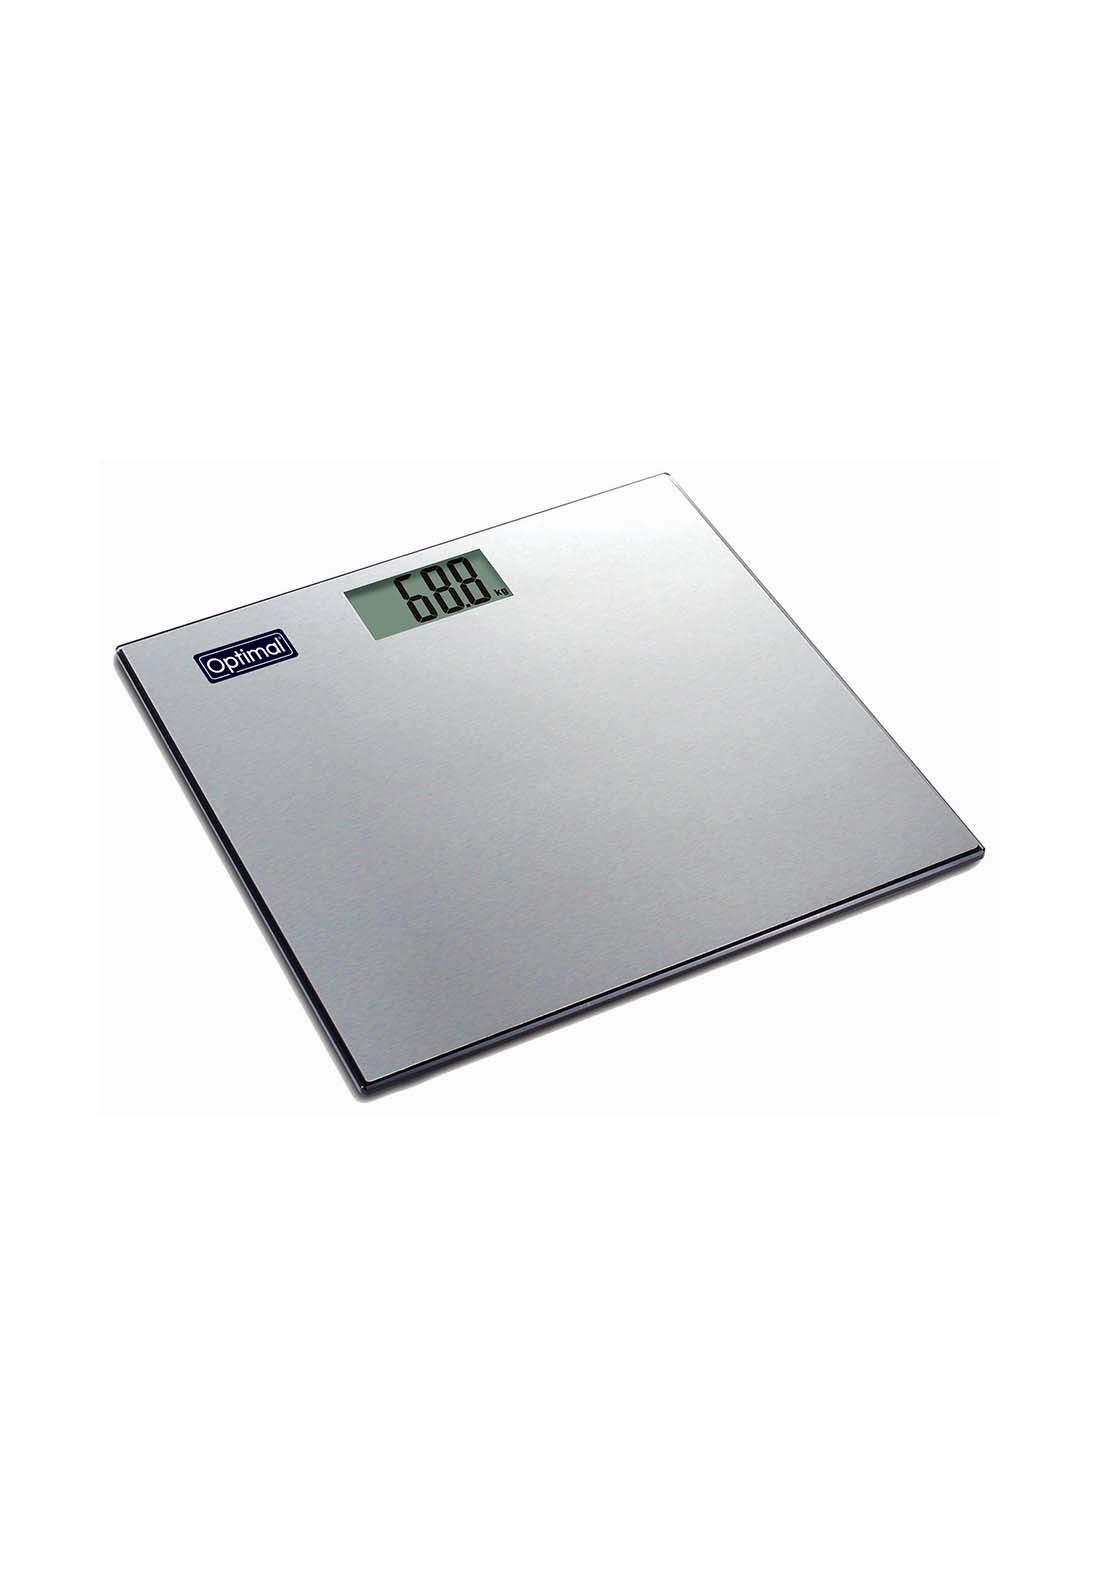 Optimal Ultra Slim Stainless Steel Electronic Scale ميزان الكتروني